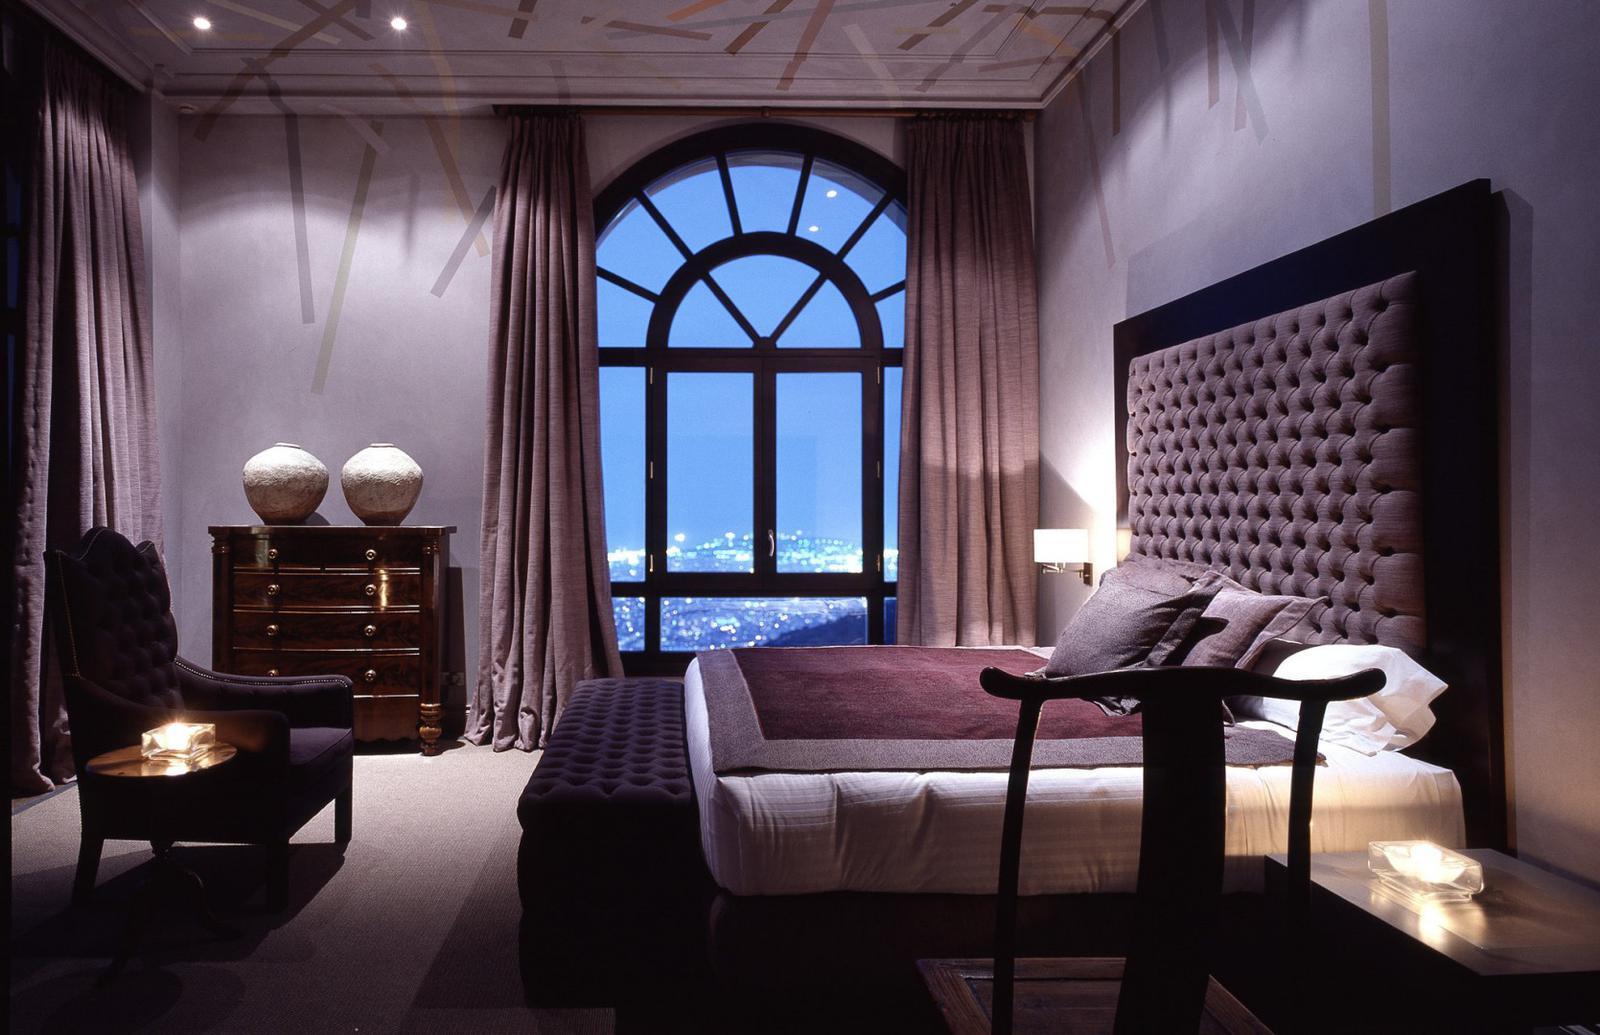 Descubre 5 hoteles de lujo baratos en espa a for Hoteles rurales de lujo